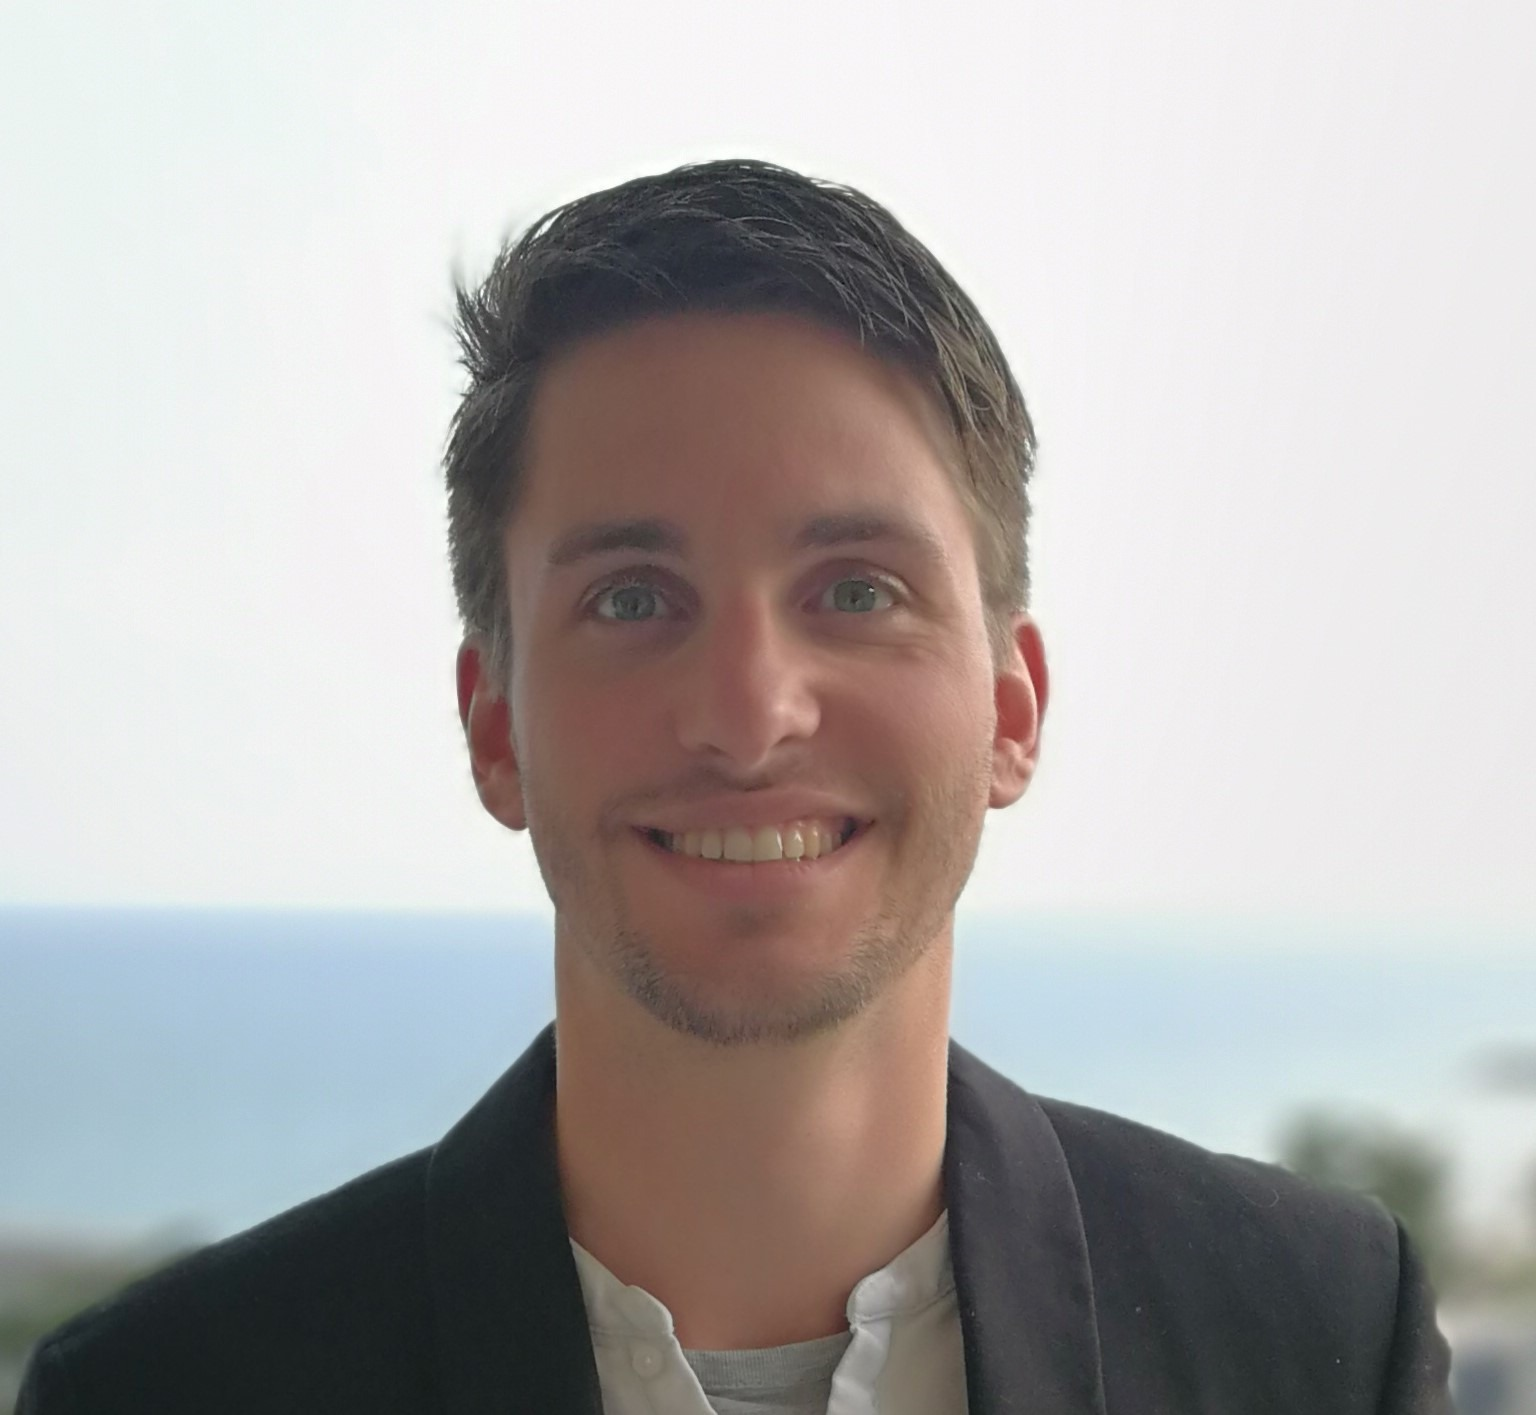 Matthew Boeddekerv